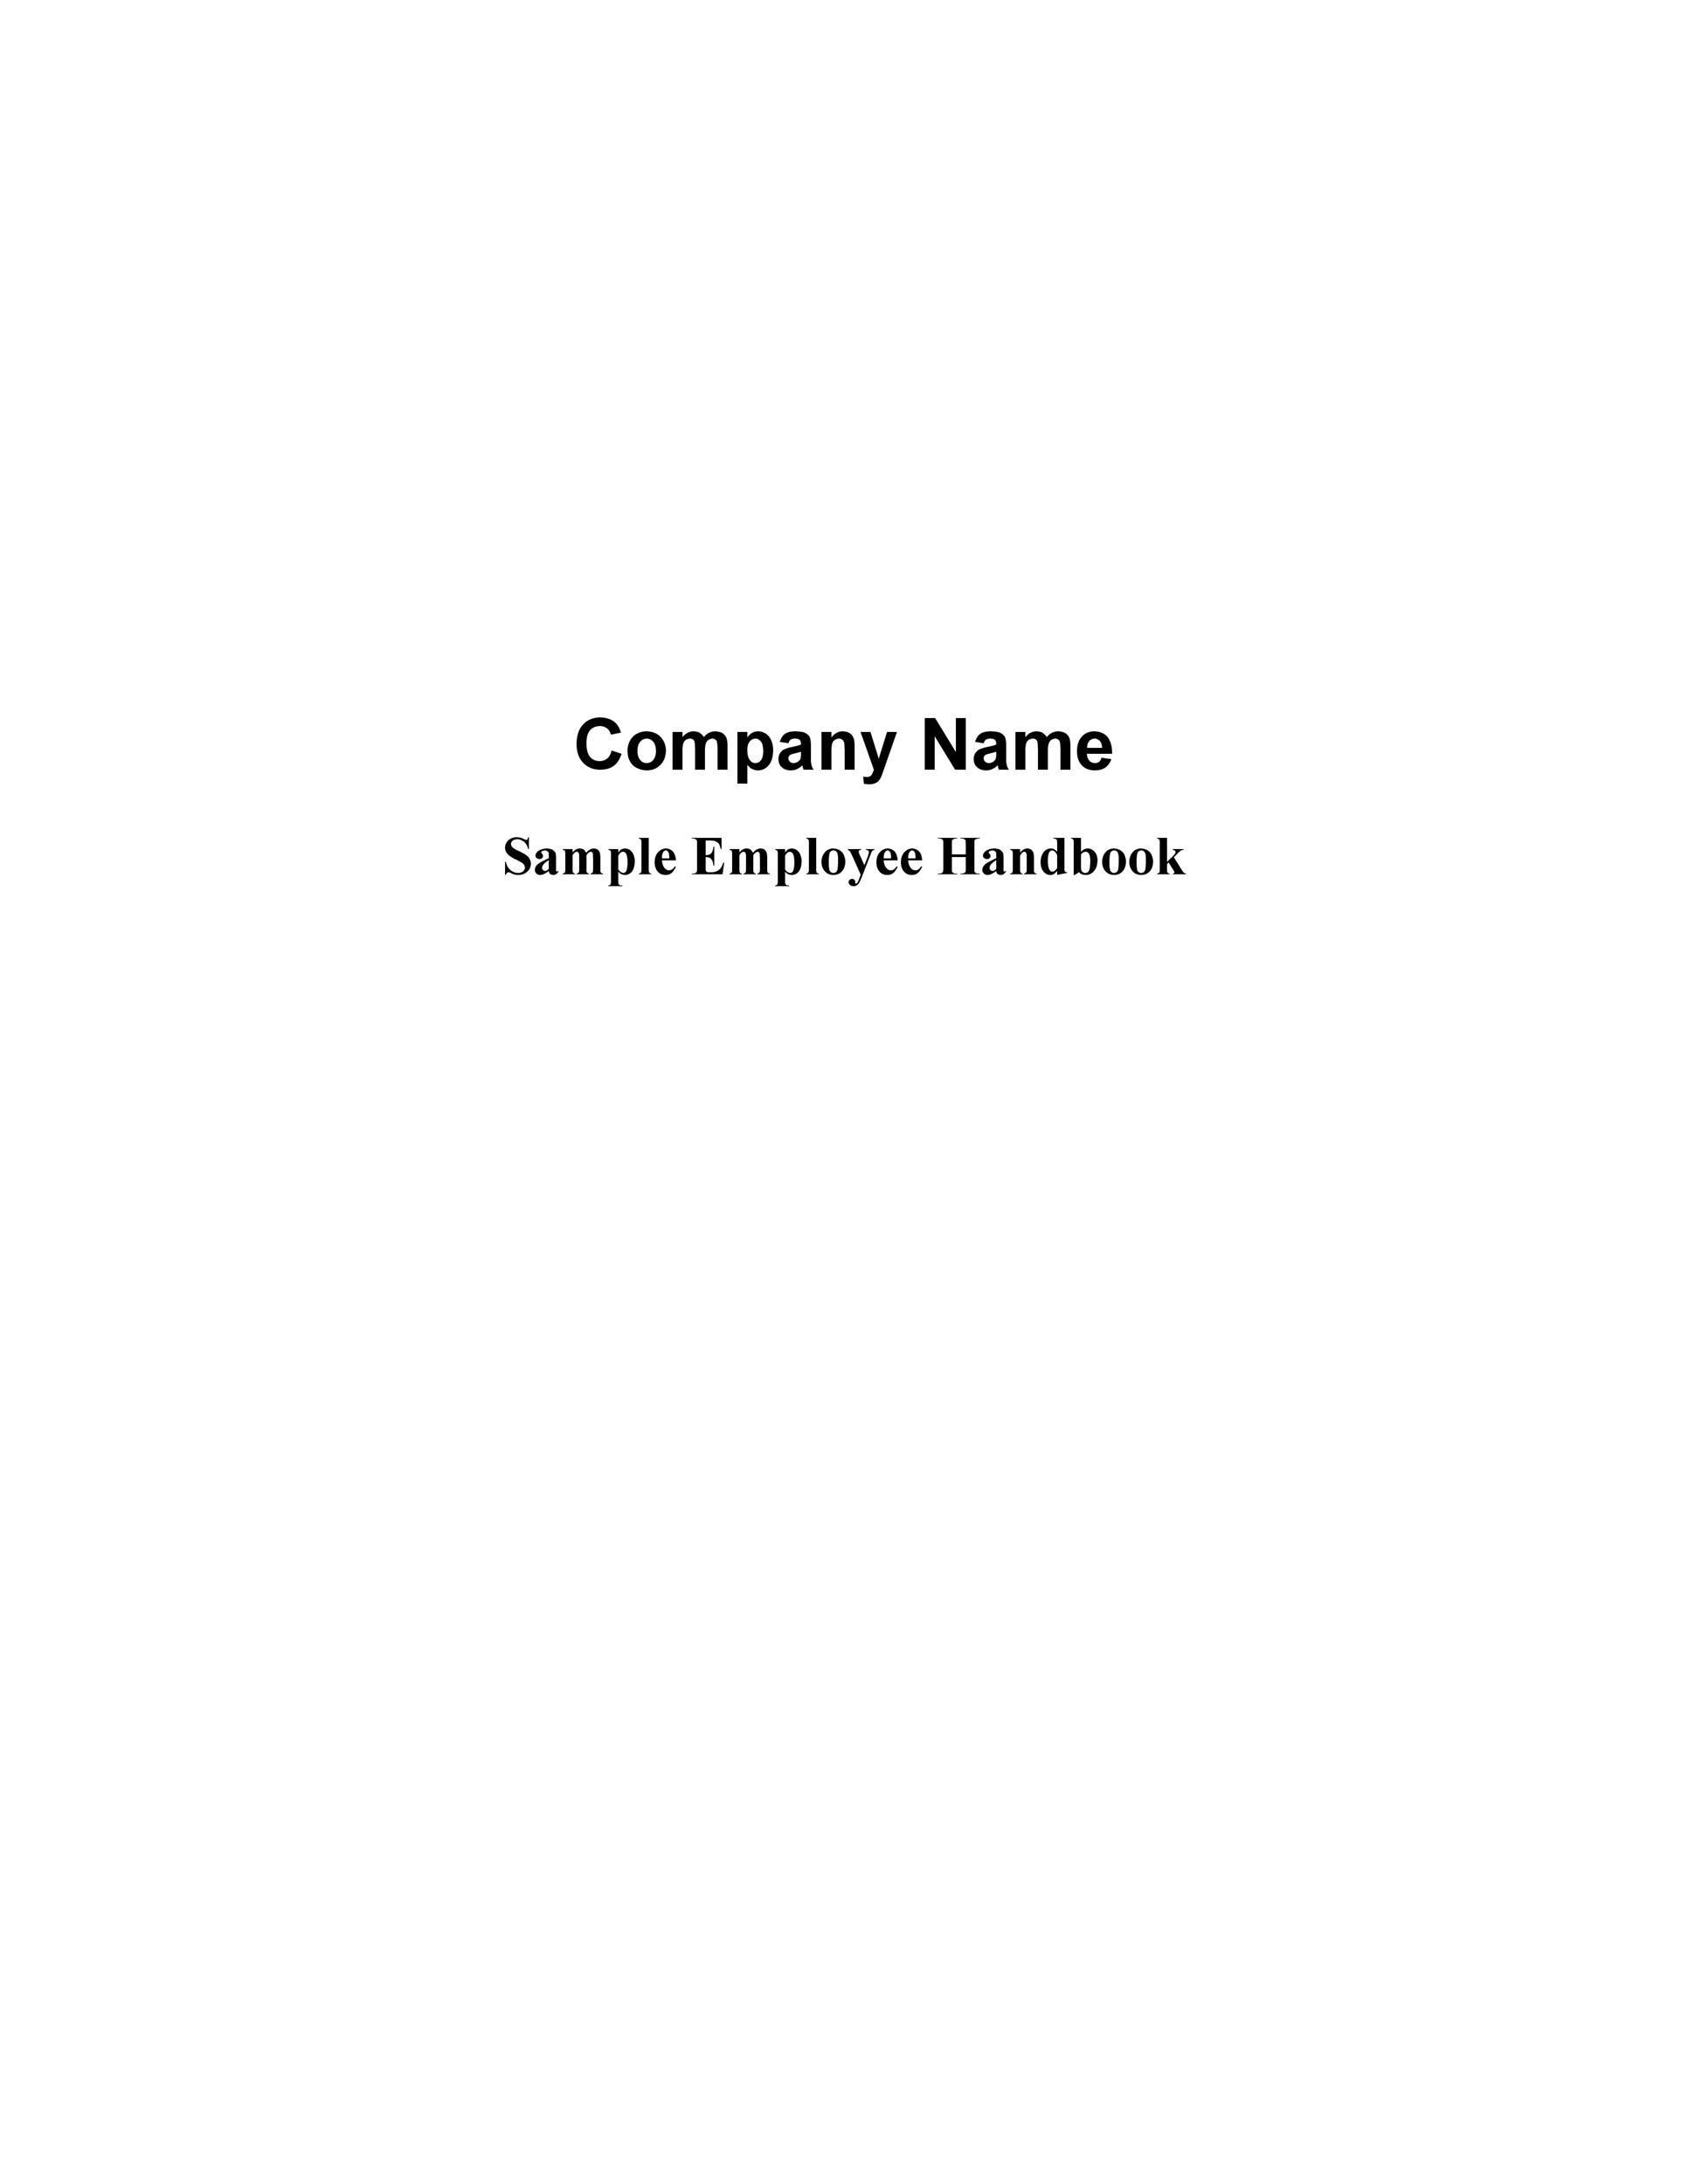 Free employee handbook template 34